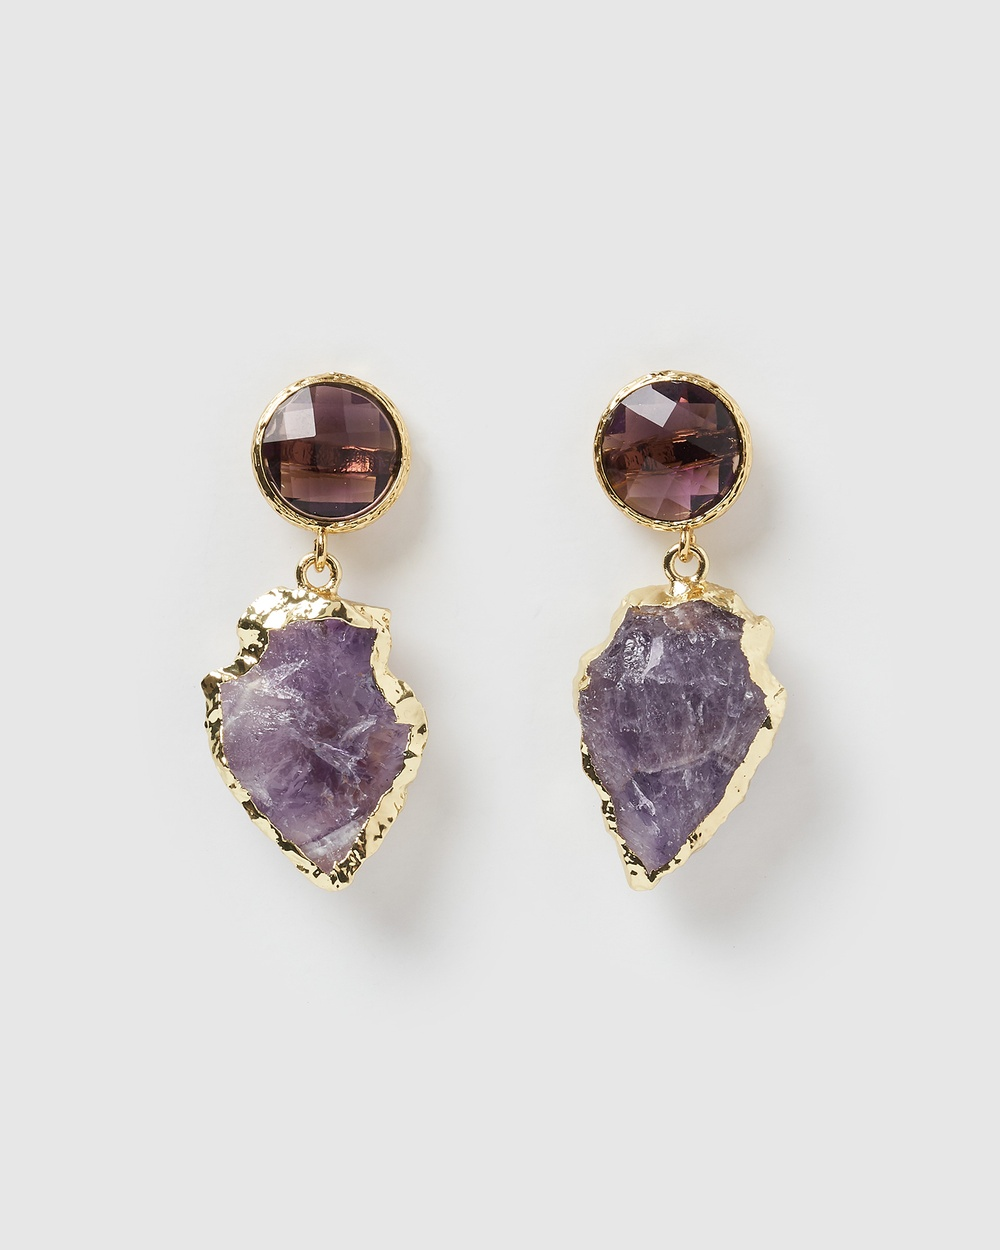 Miz Casa and Co Atlis Earrings Jewellery Amethyst Gold